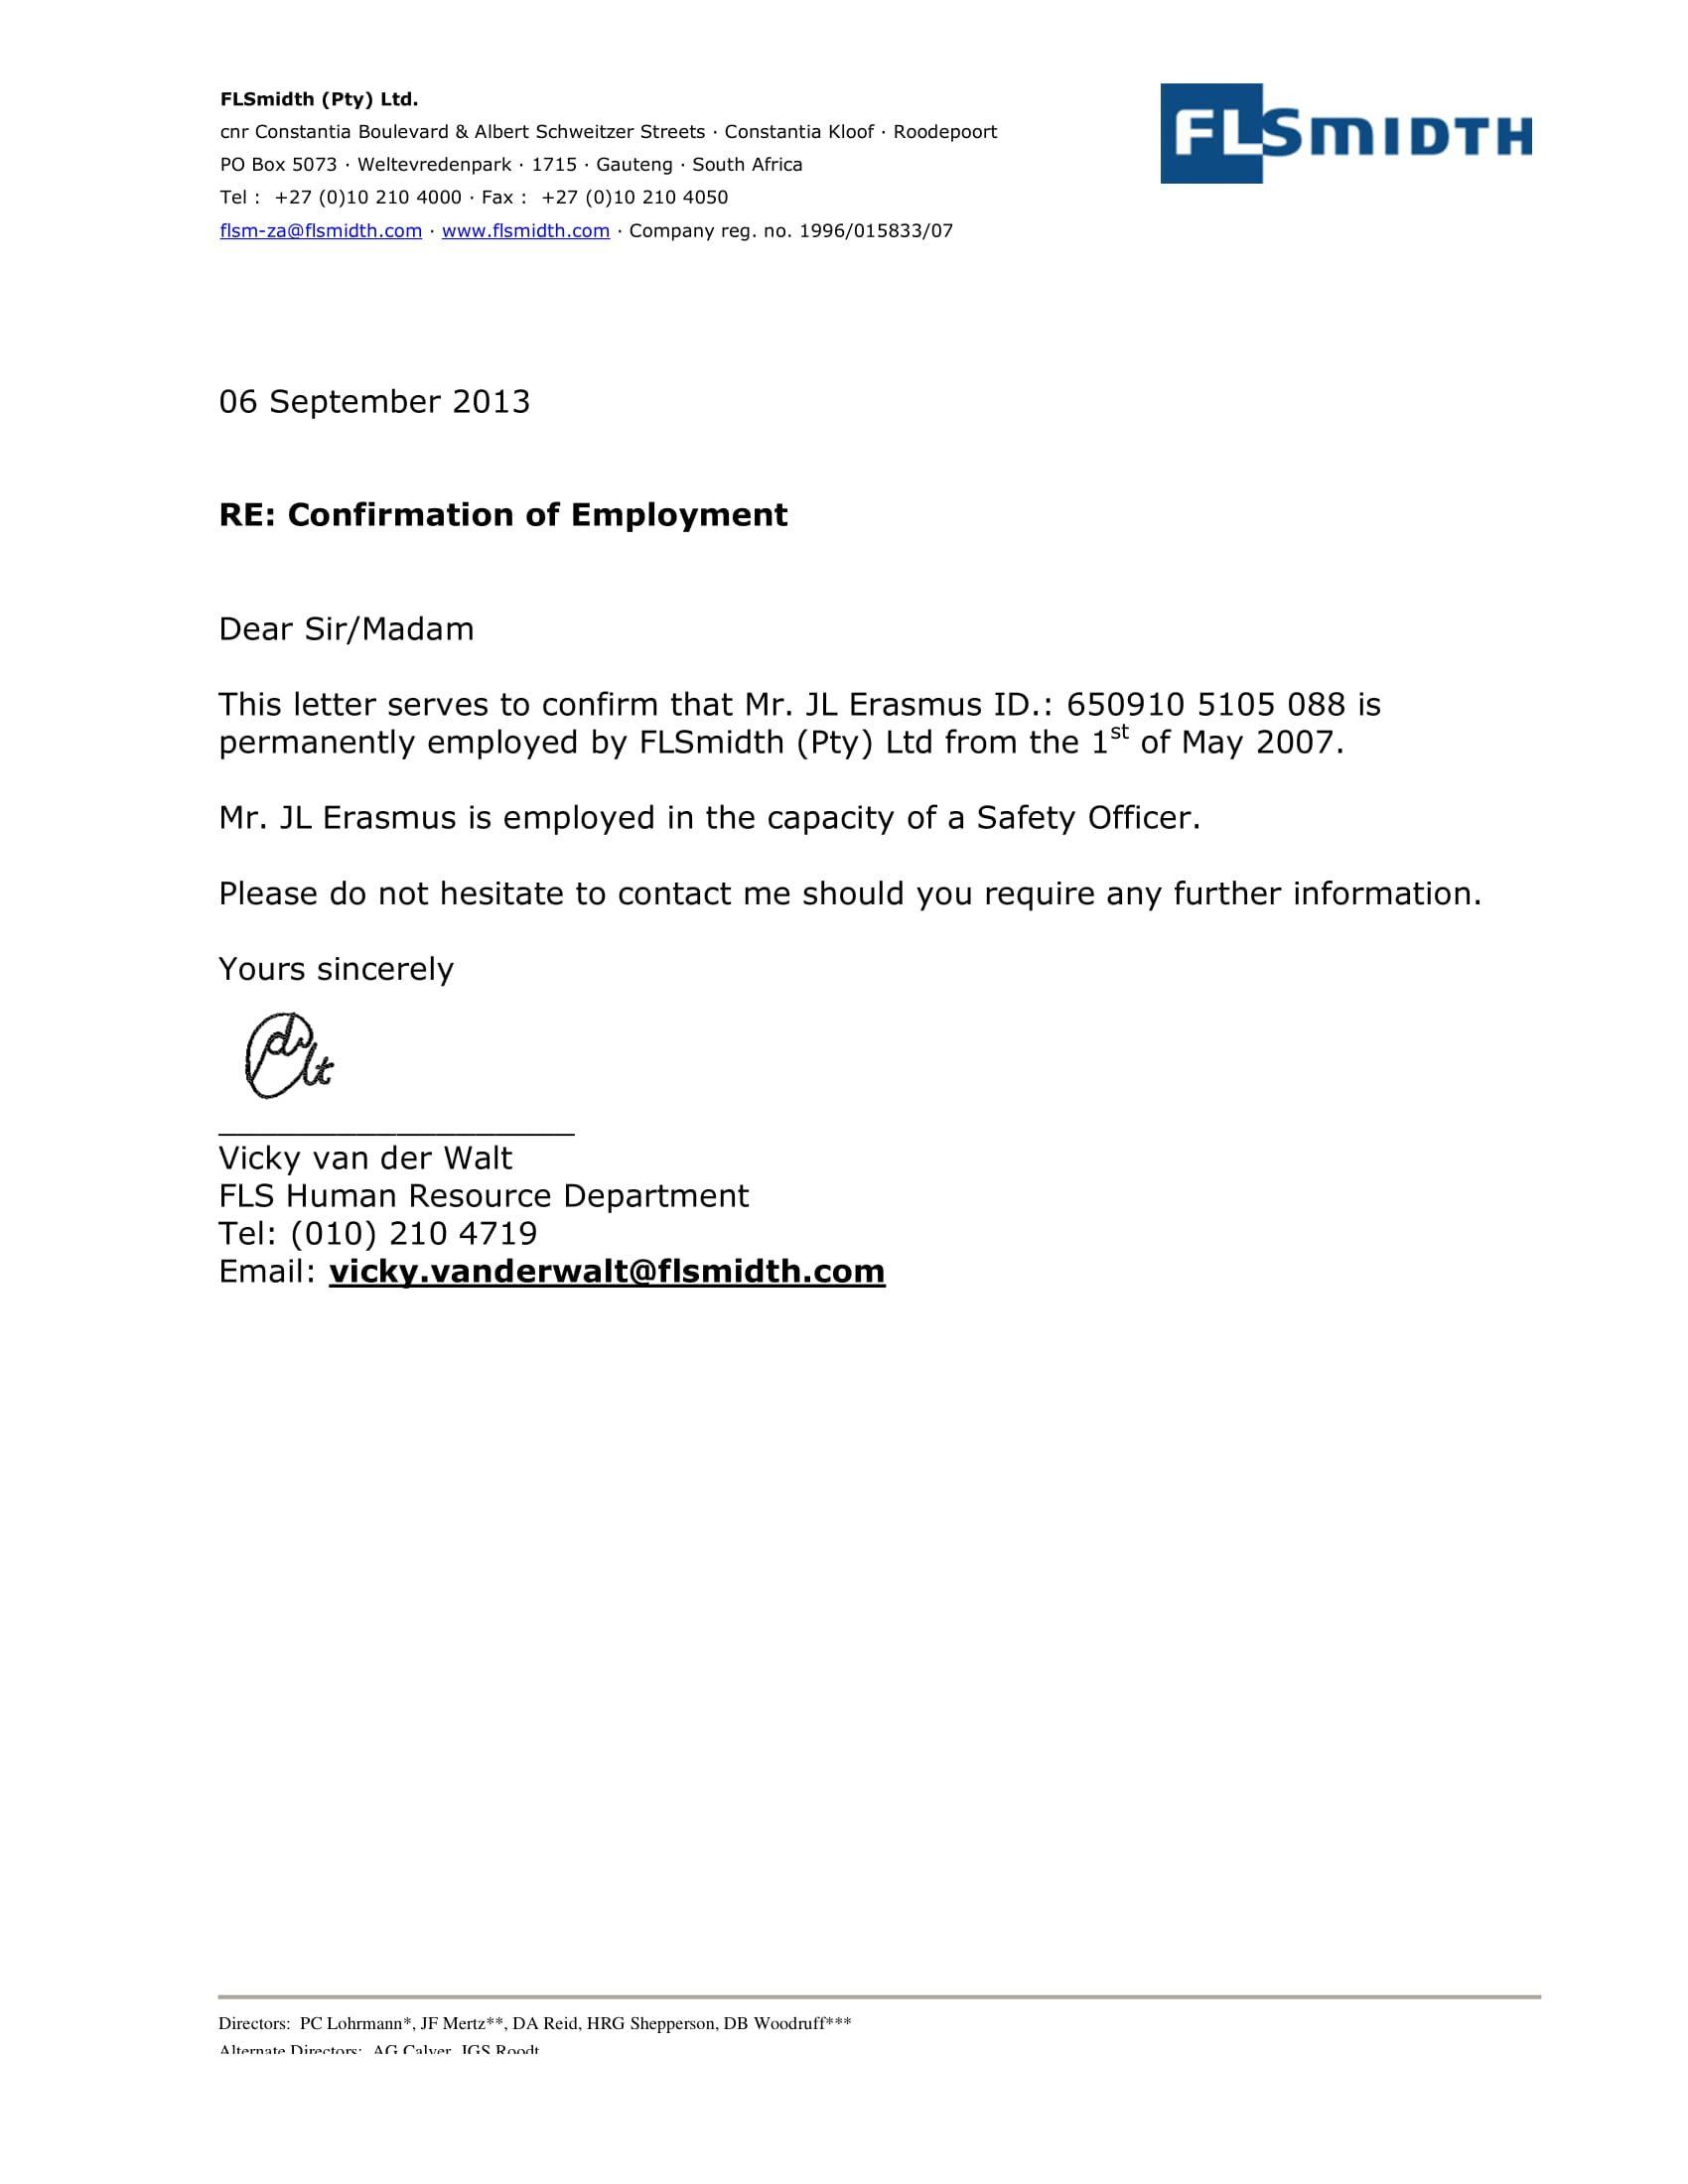 Fresh Employment Verification Letter For You Https Letterbuis Com Fresh Employment Ver Letter Of Employment Letter Of Employment Template Confirmation Letter